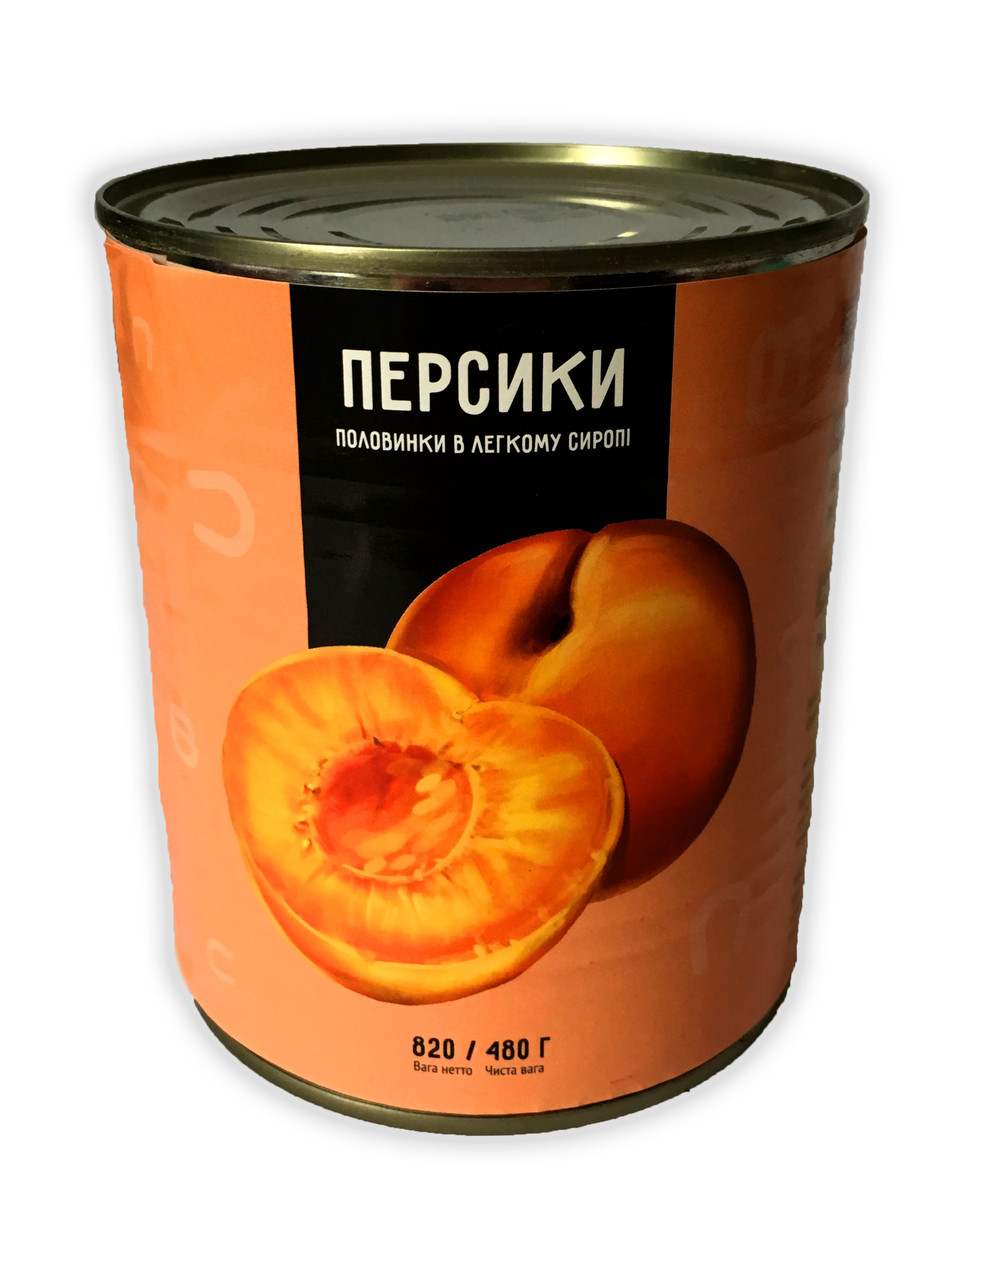 Персики половинки в сиропе 0,825г